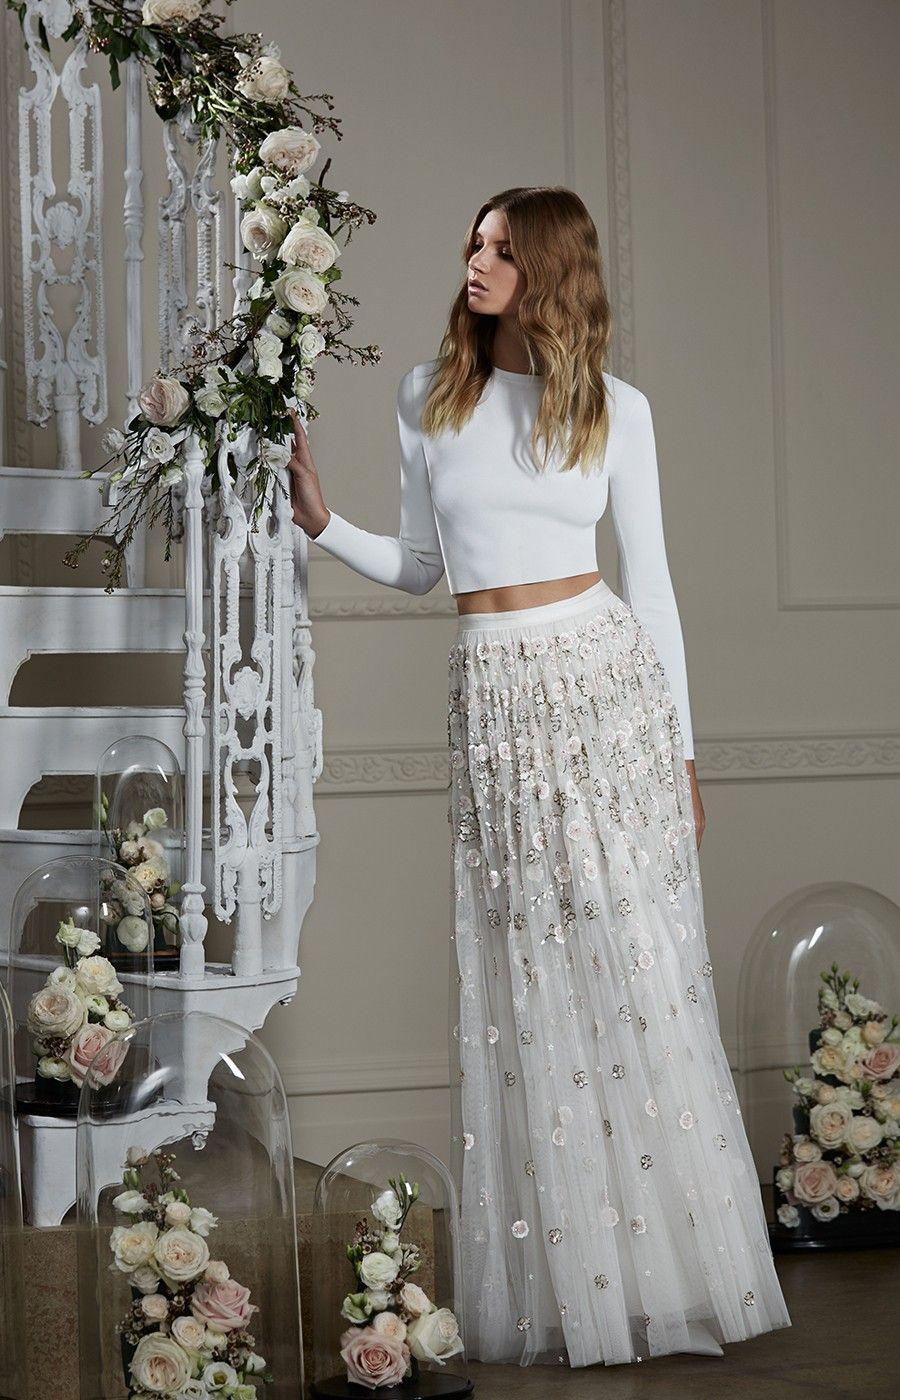 Needle & Thread AW16 Bridal Collection Designer wedding